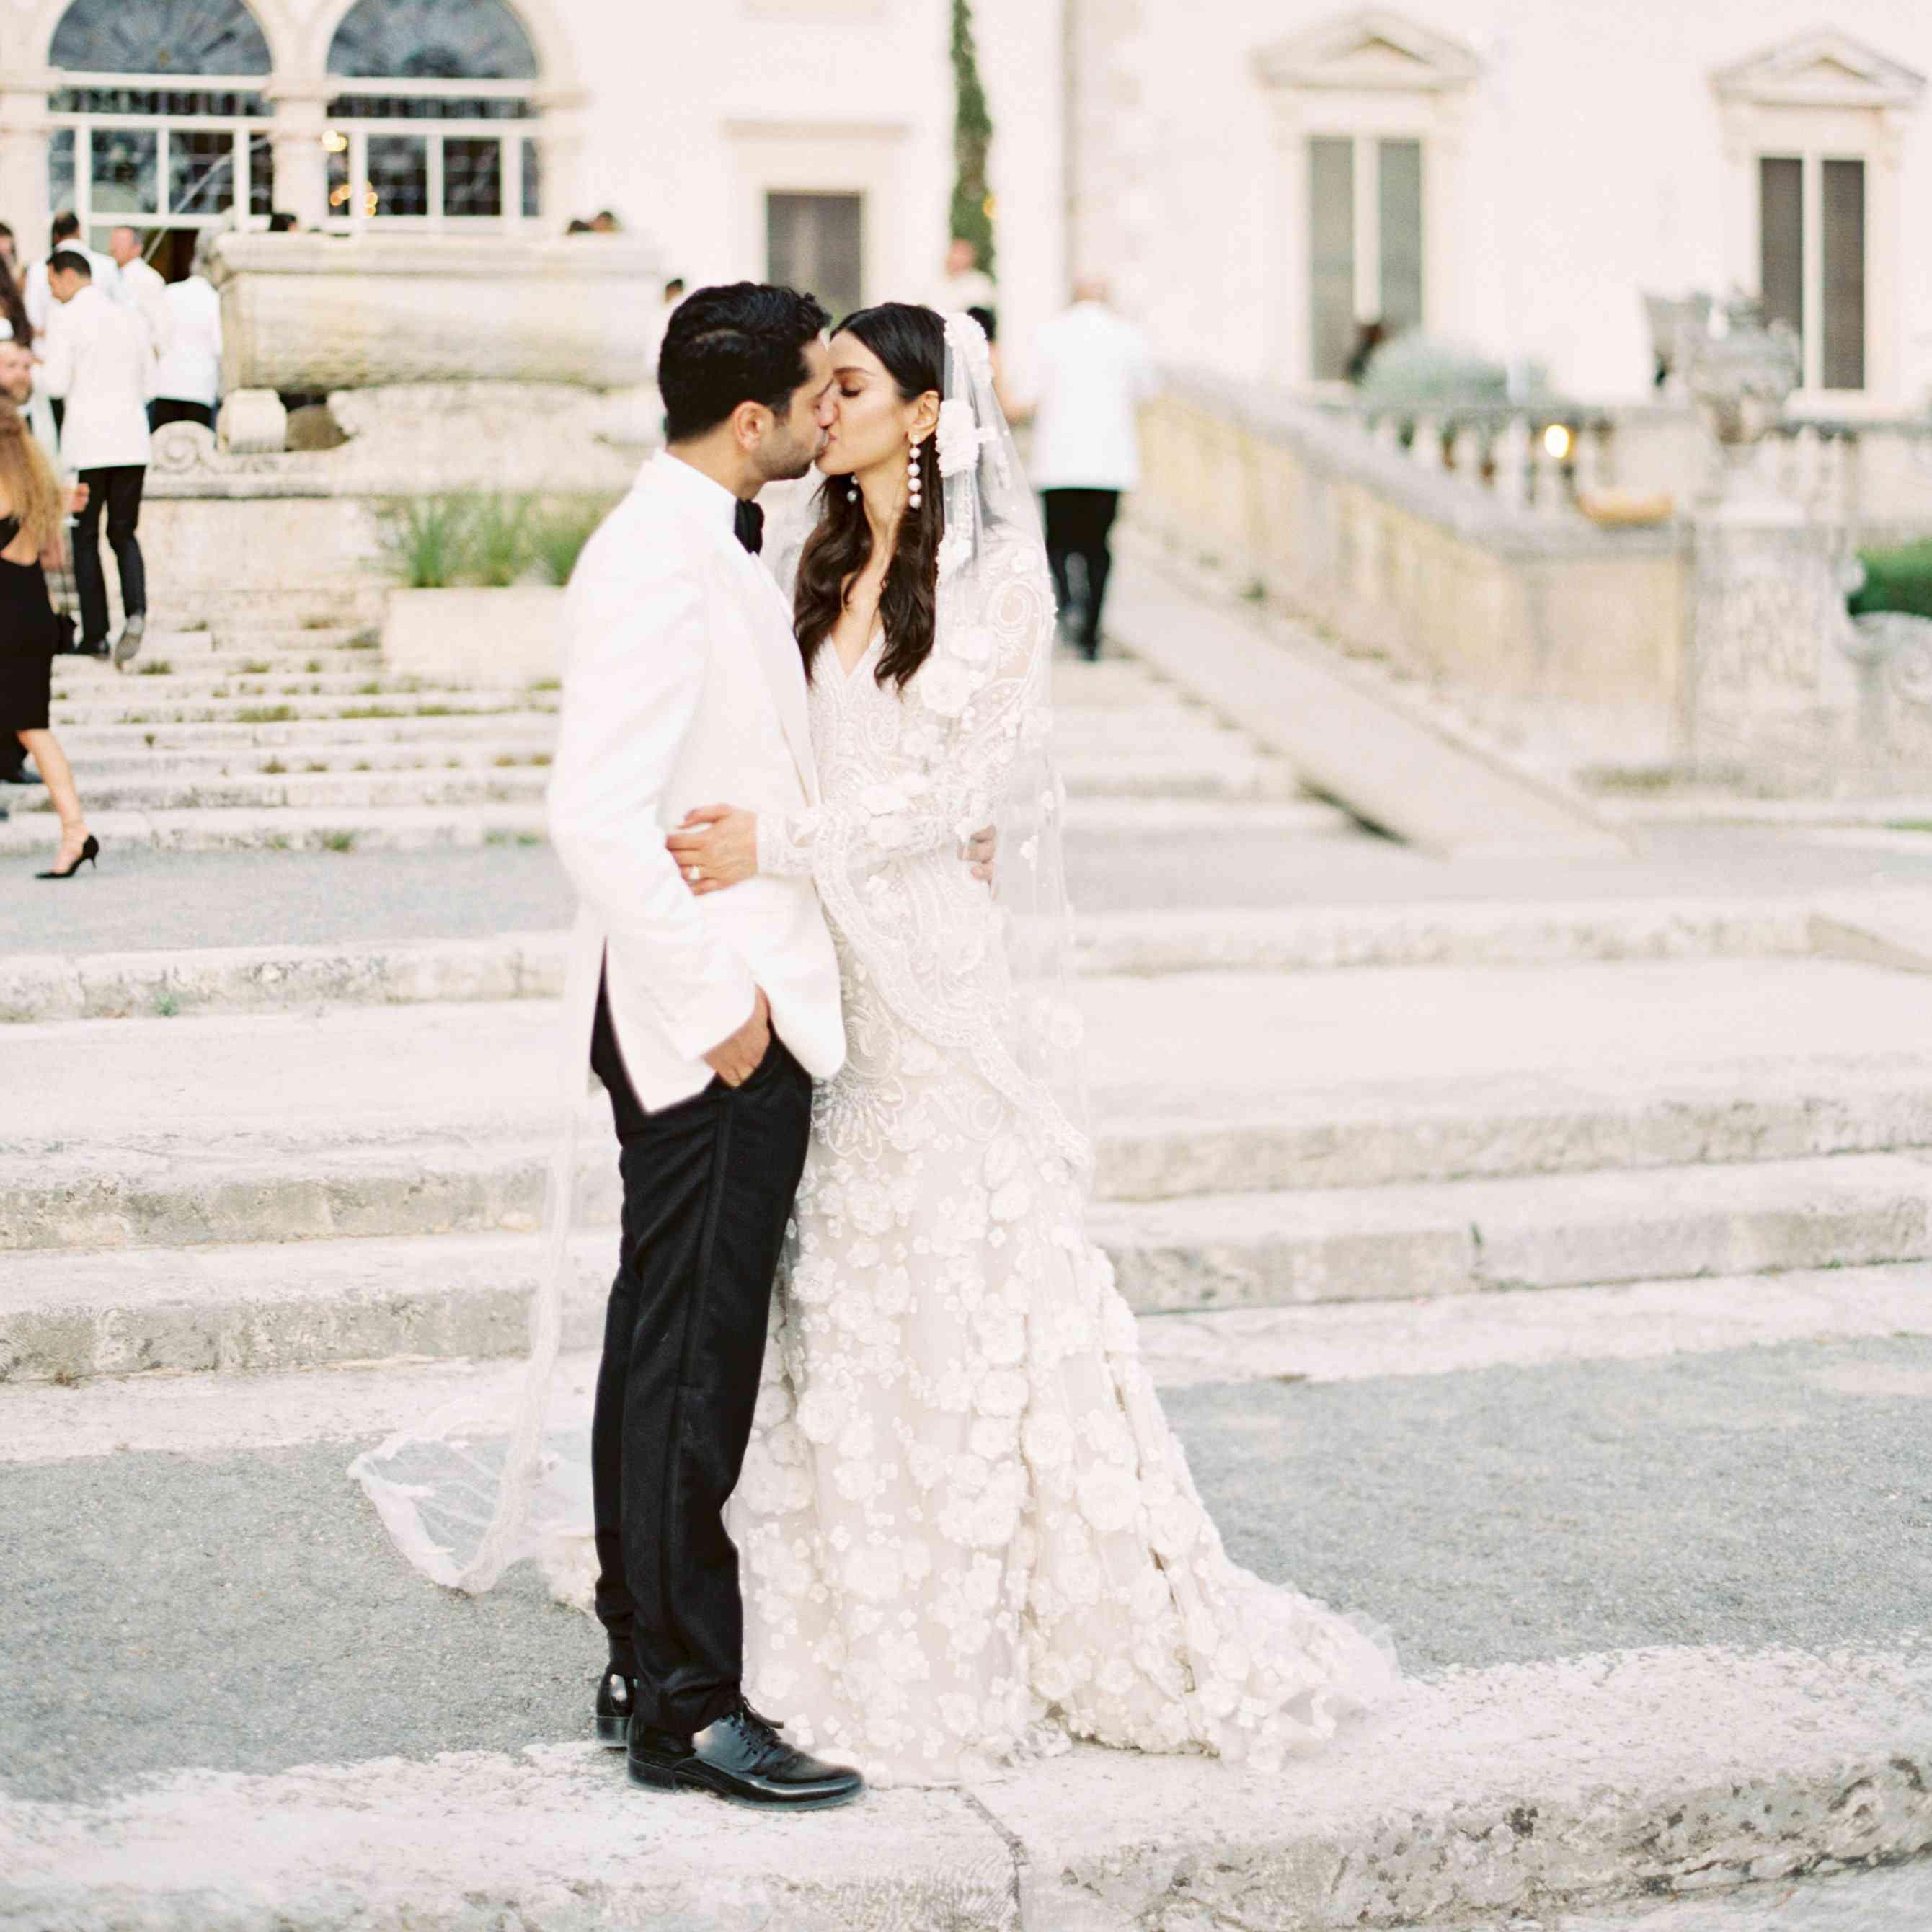 Wedding Dresses Miami.A Romantic Miami Wedding With A Garden By The Sea Theme